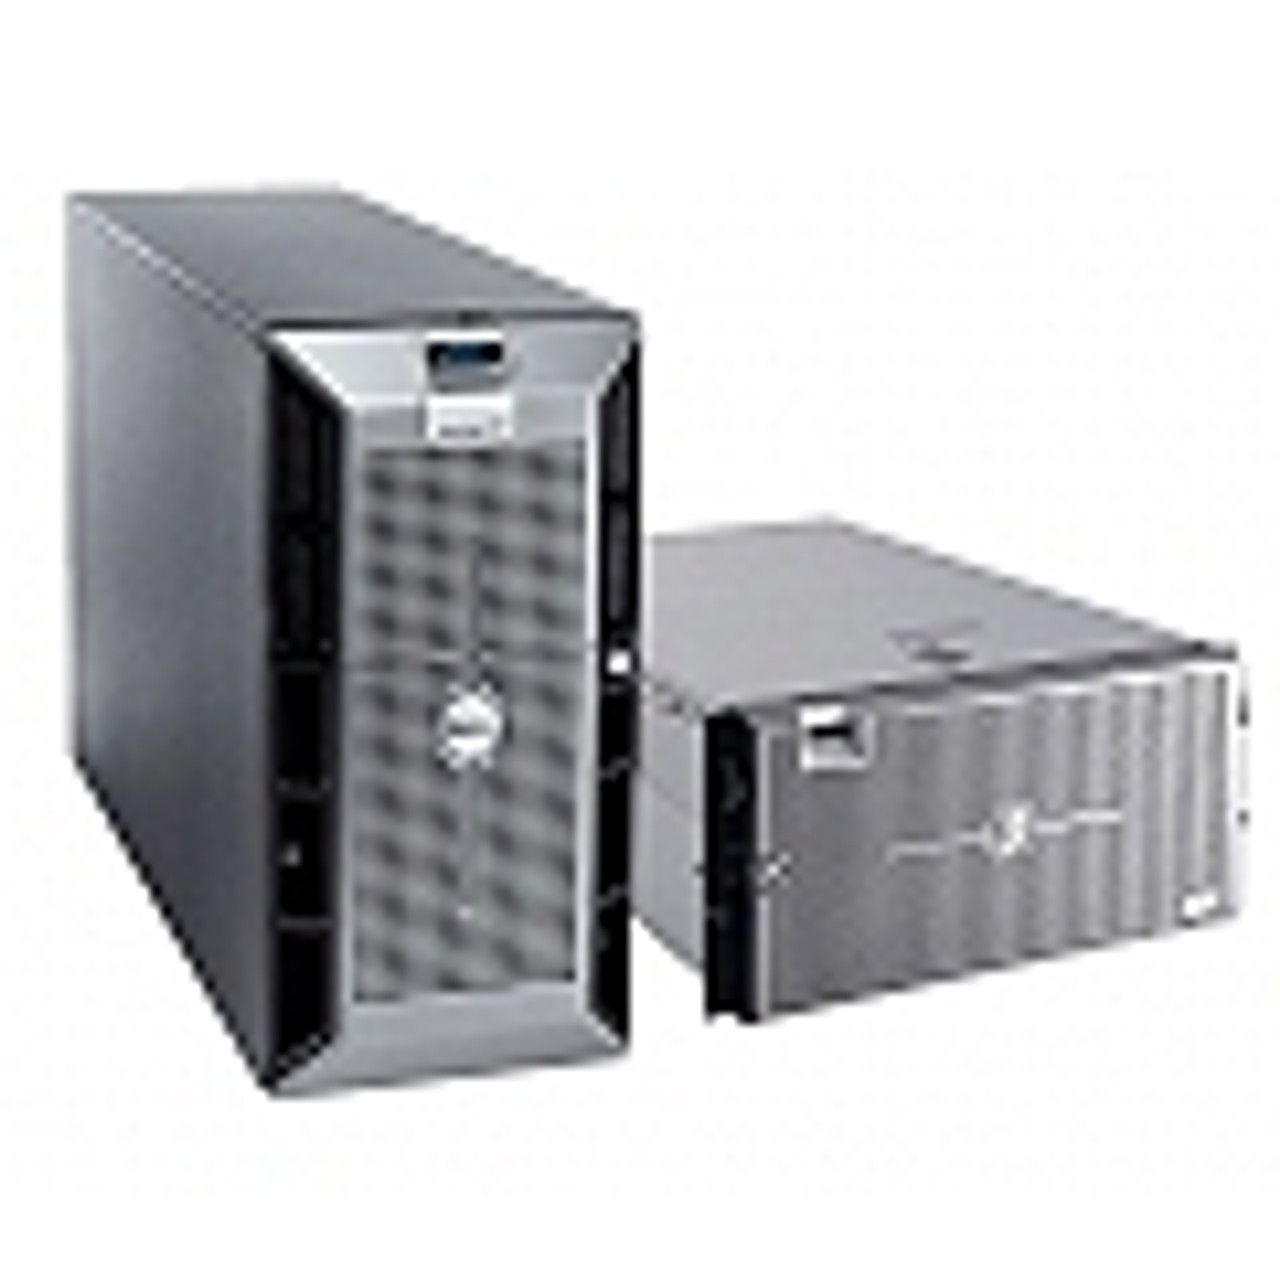 Dell PowerEdge 2900 Servers